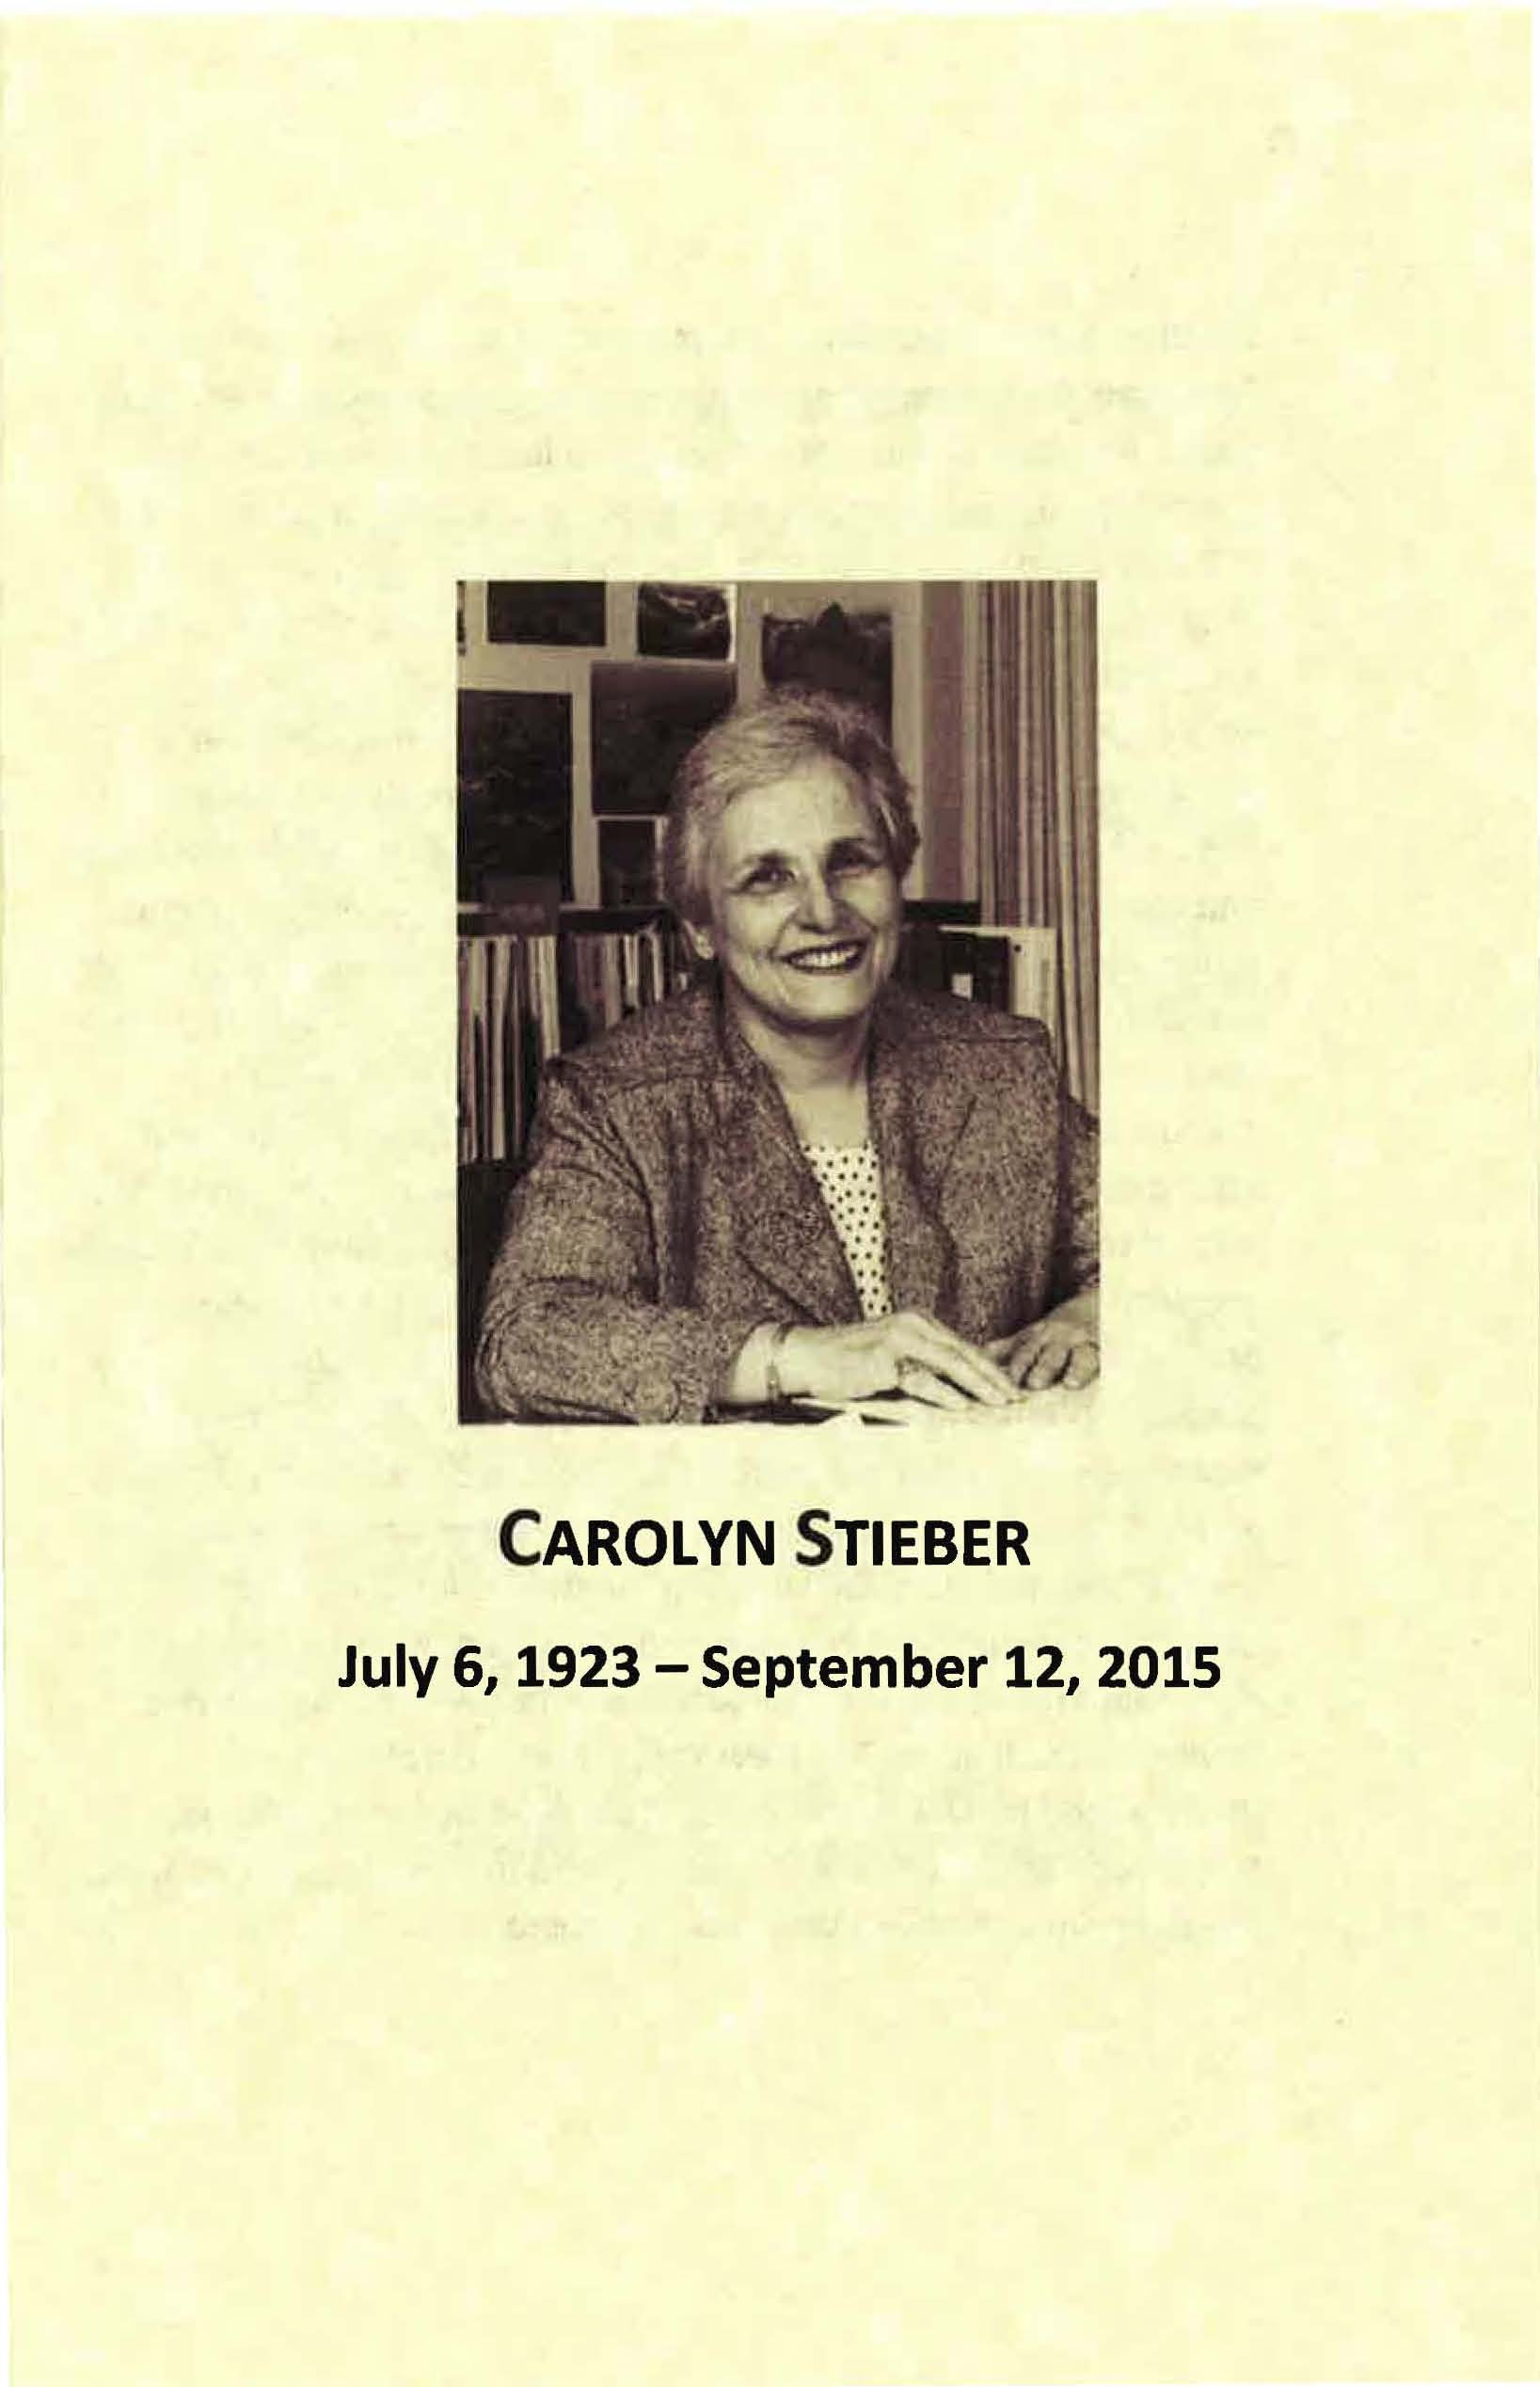 Carolyn Stieber memorial service program, 2015